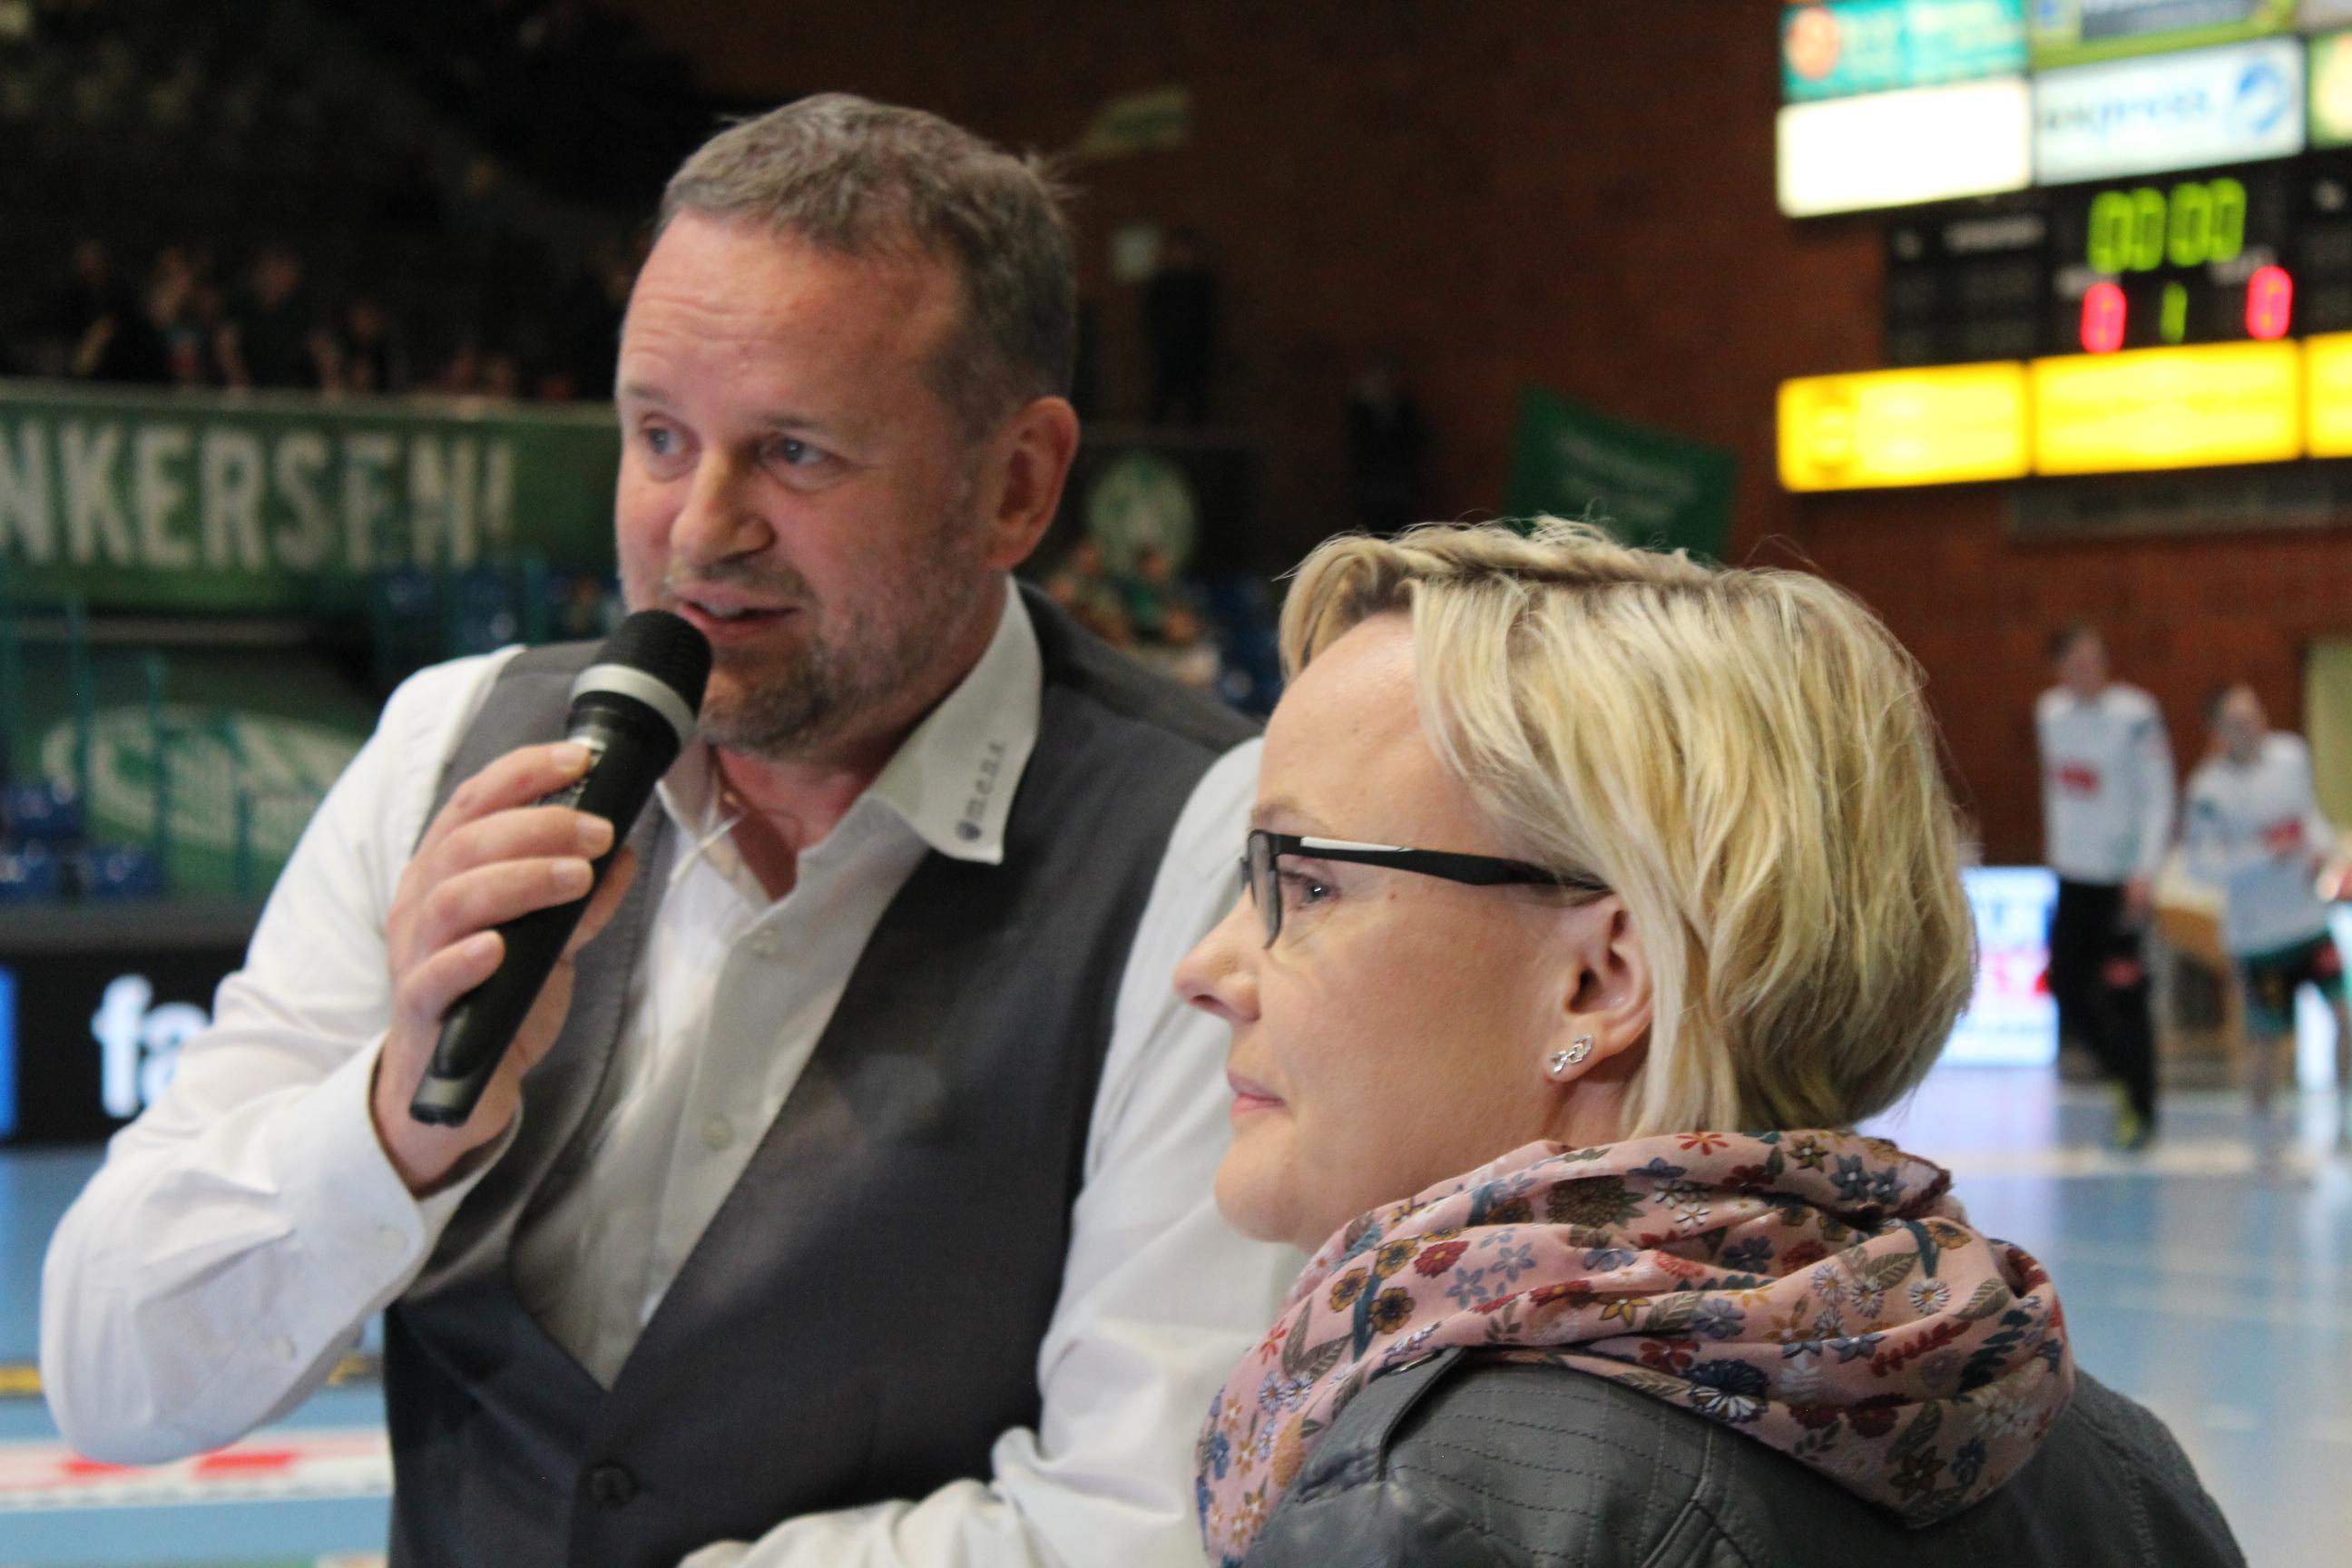 Hacken am Kreis Handball Blog: GWD Minden vs. Rhein-Neckar Löwen